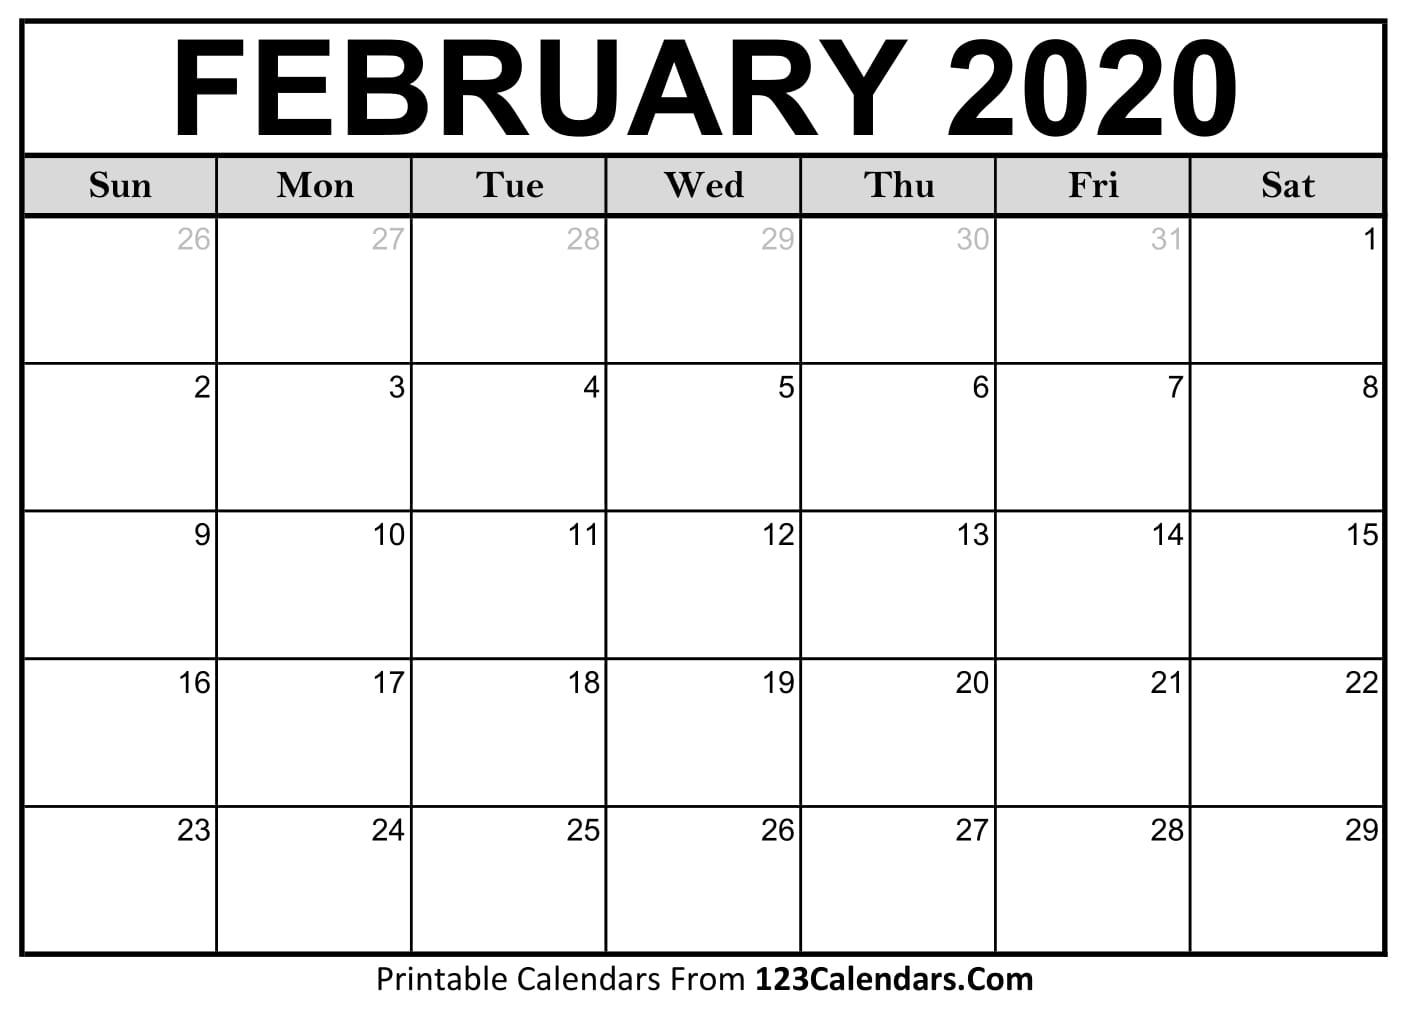 February 2020 Printable Calendar | 123Calendars